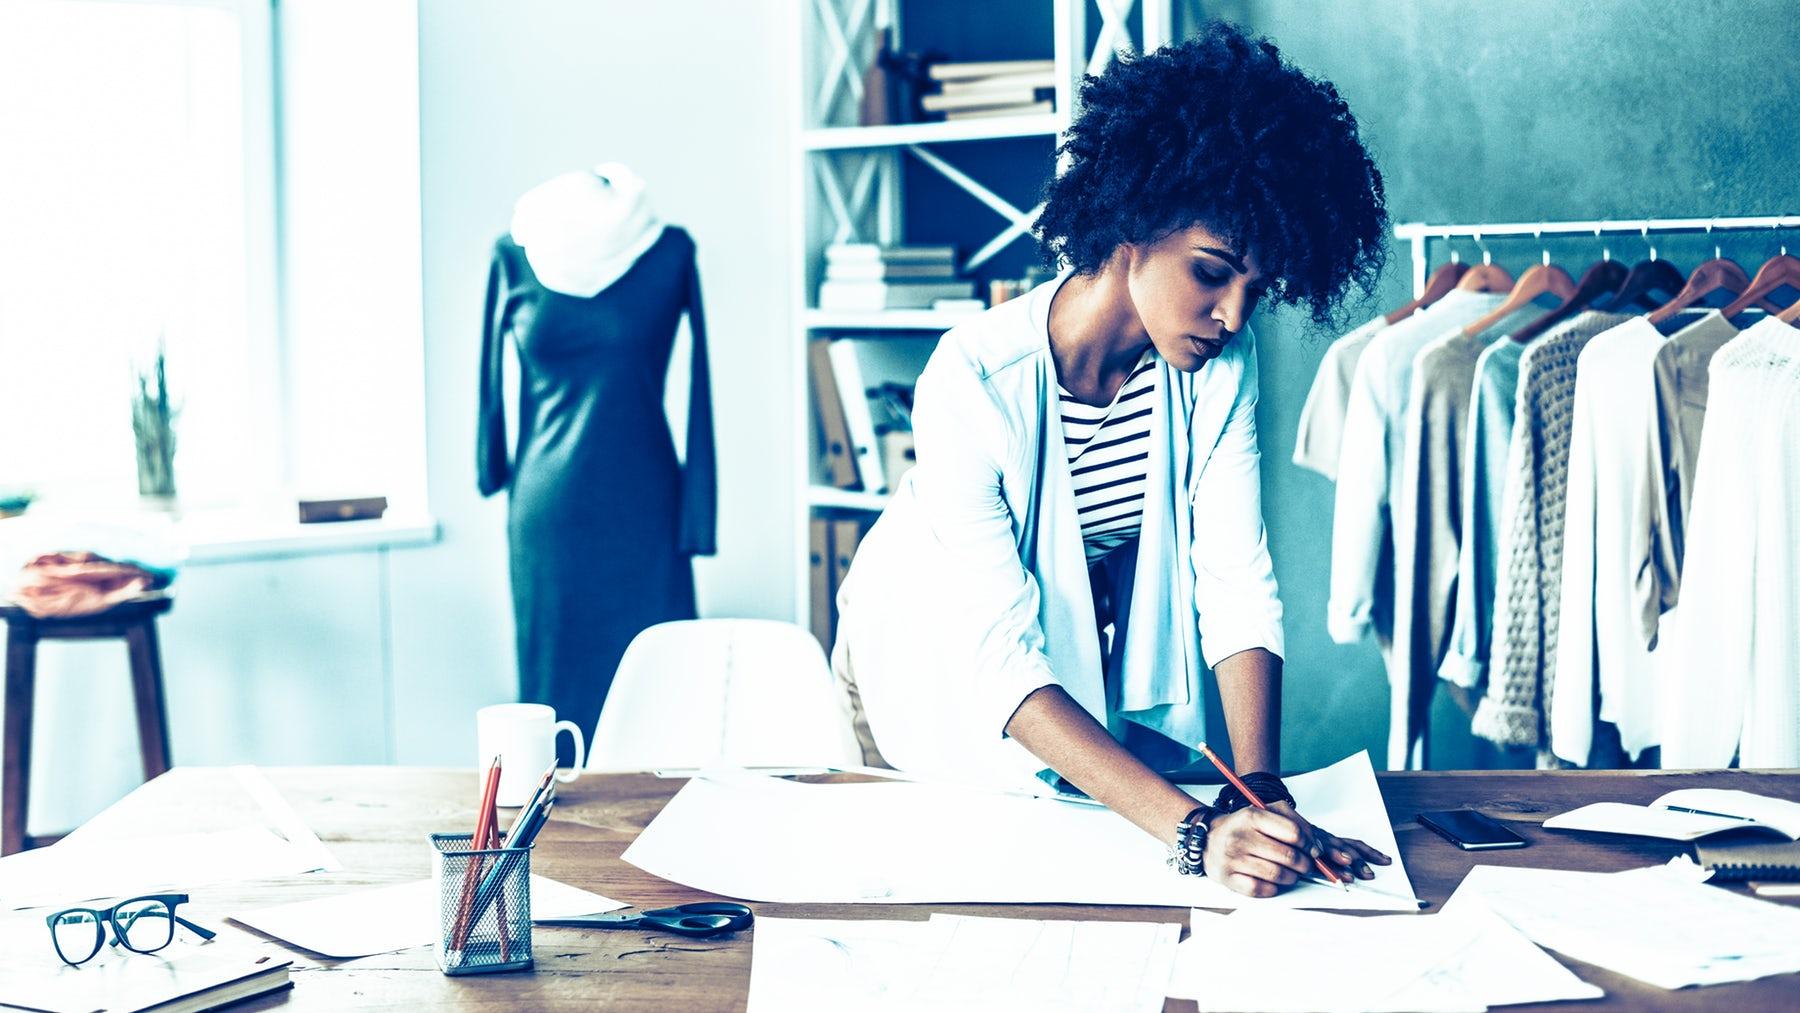 BoF unveils its Global Fashion School Rankings 2017 | Source: Shutterstock